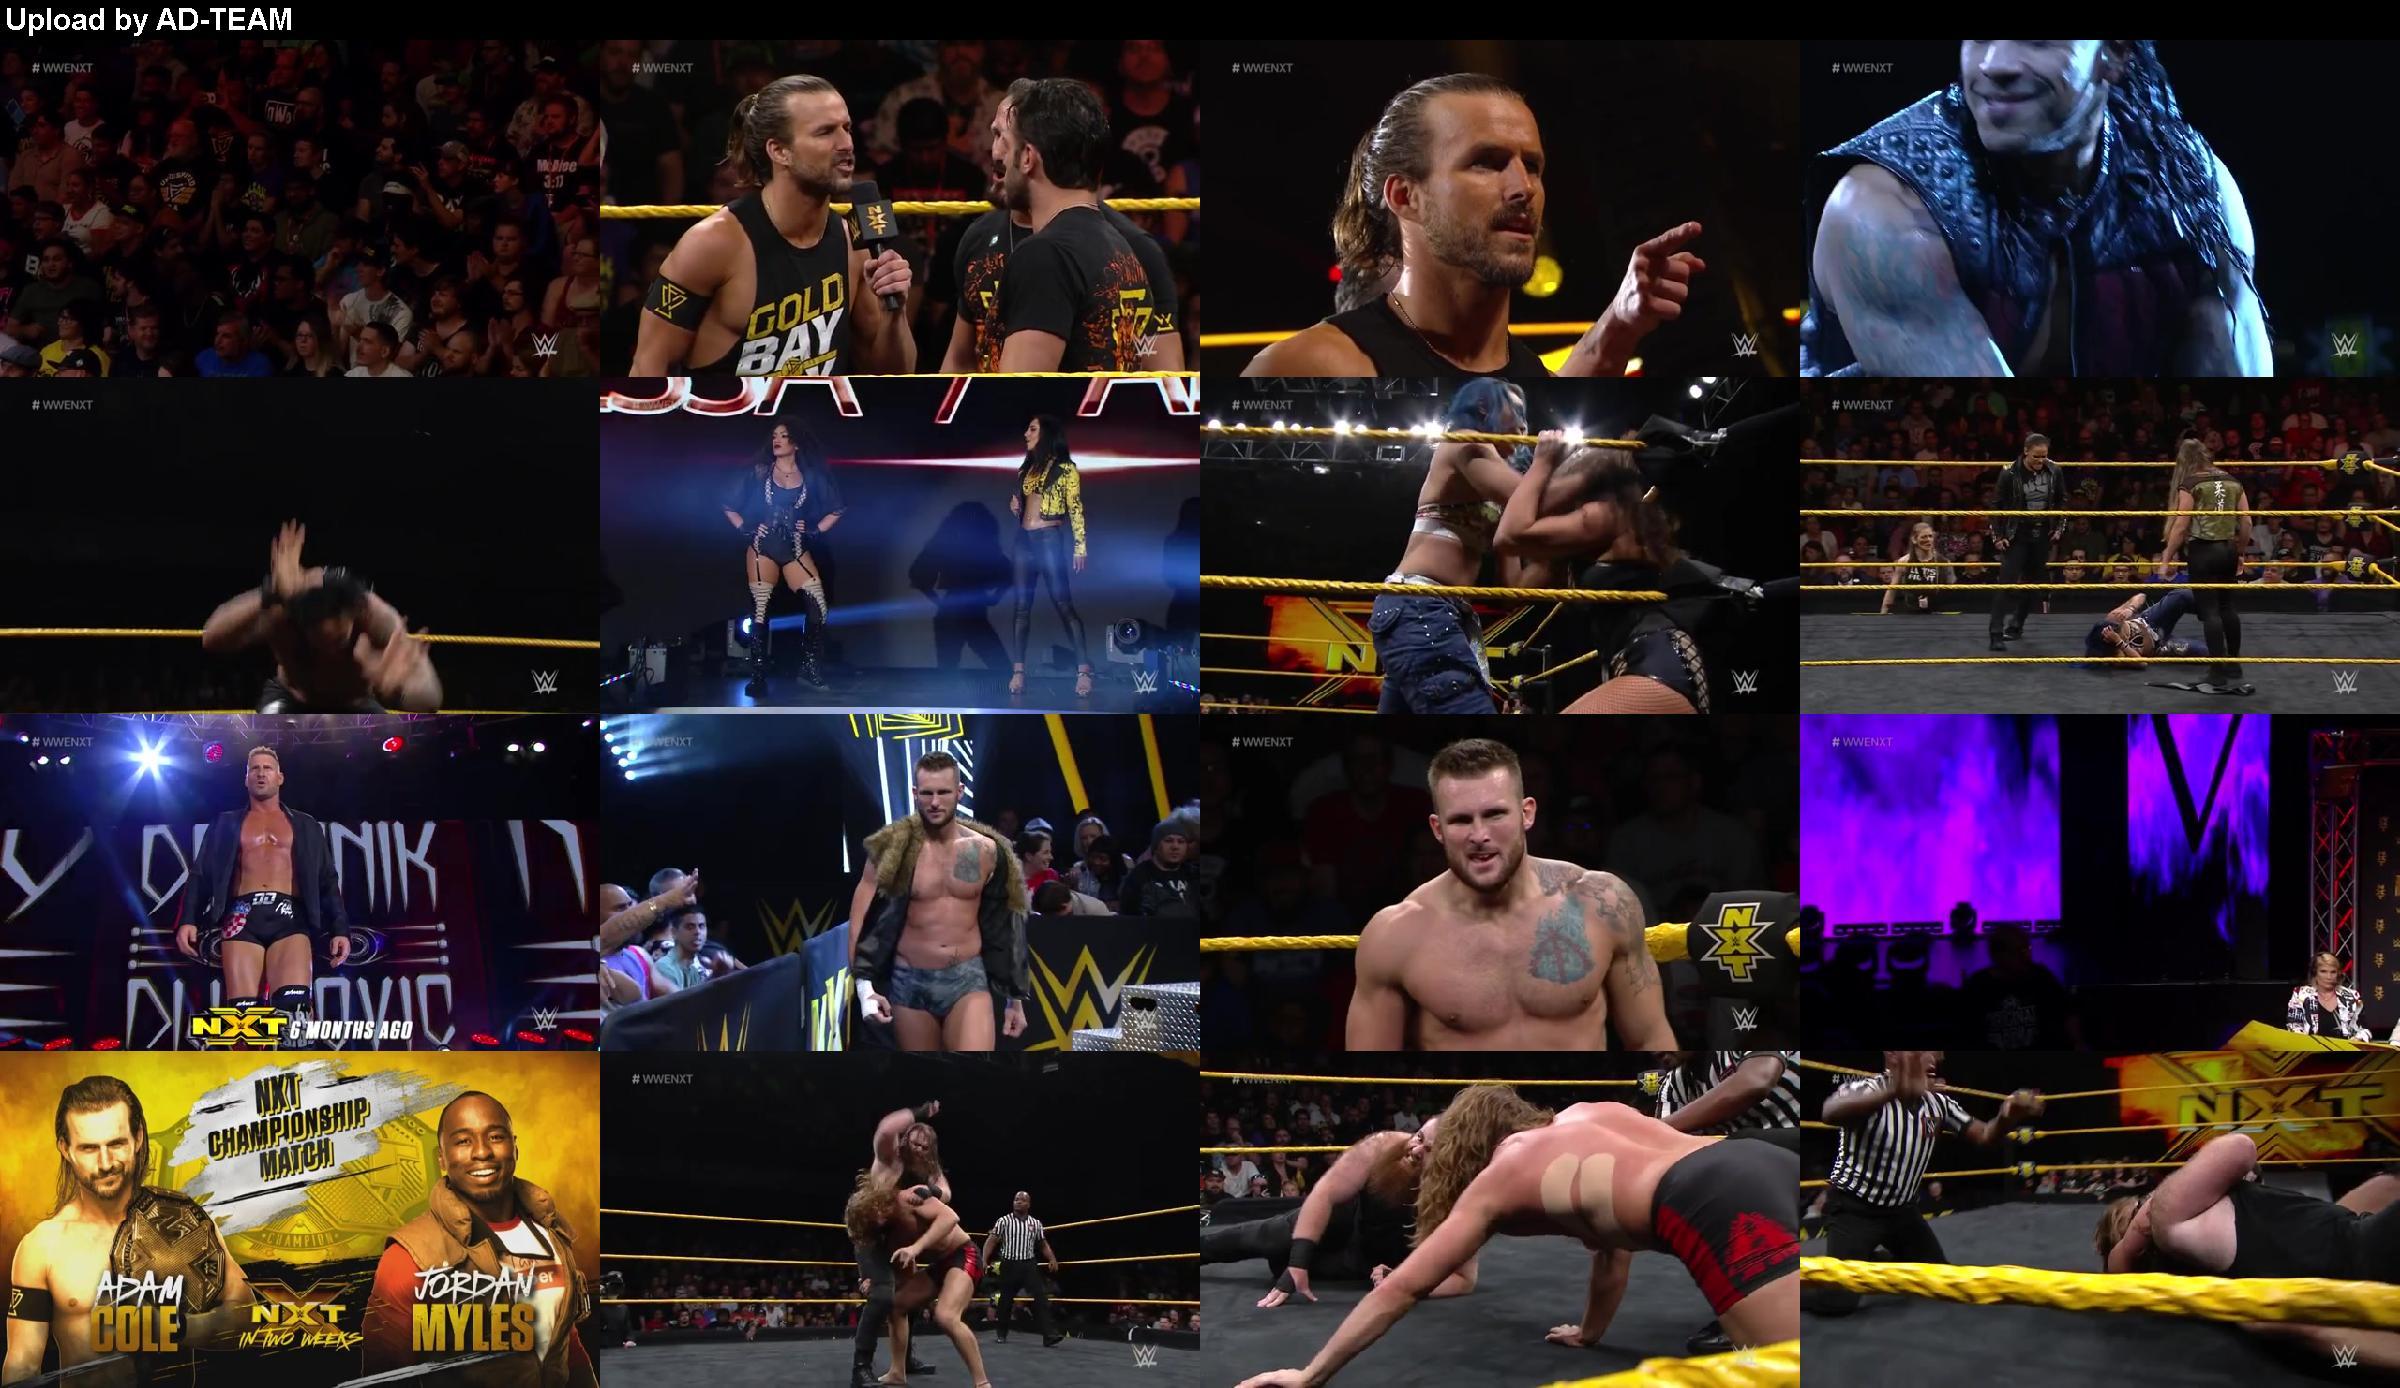 WWE NXT 2019 08 21 AAC MP4-Mobile